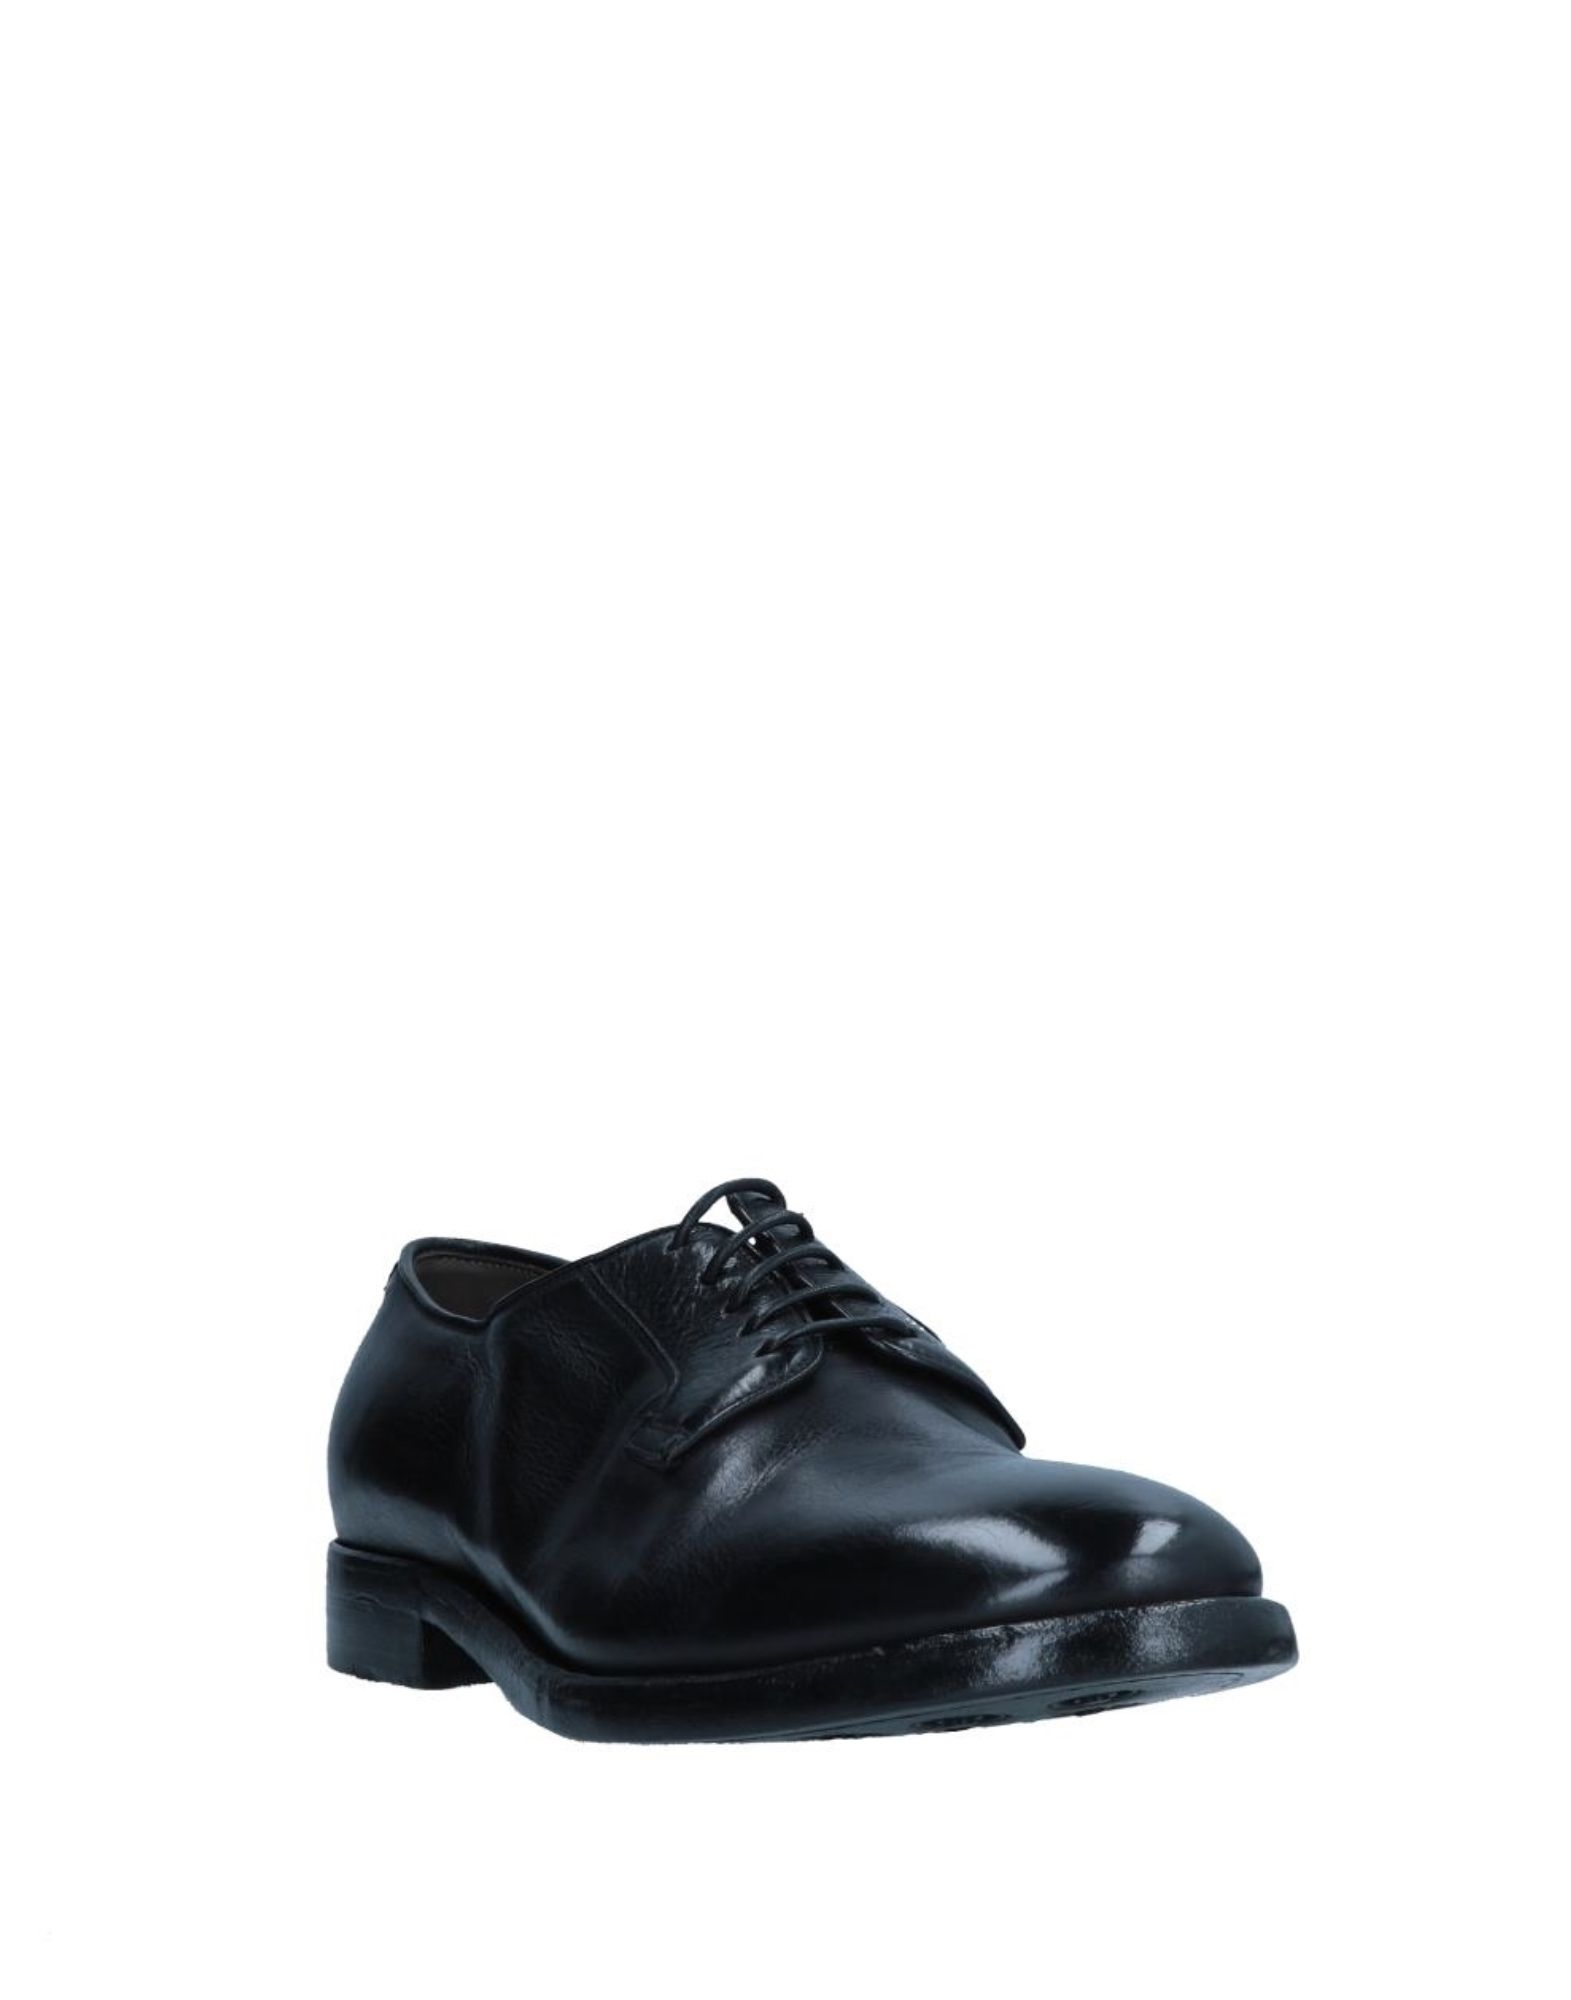 Silvano 11546681WI Sassetti Schnürschuhe Herren  11546681WI Silvano Gute Qualität beliebte Schuhe 199e16